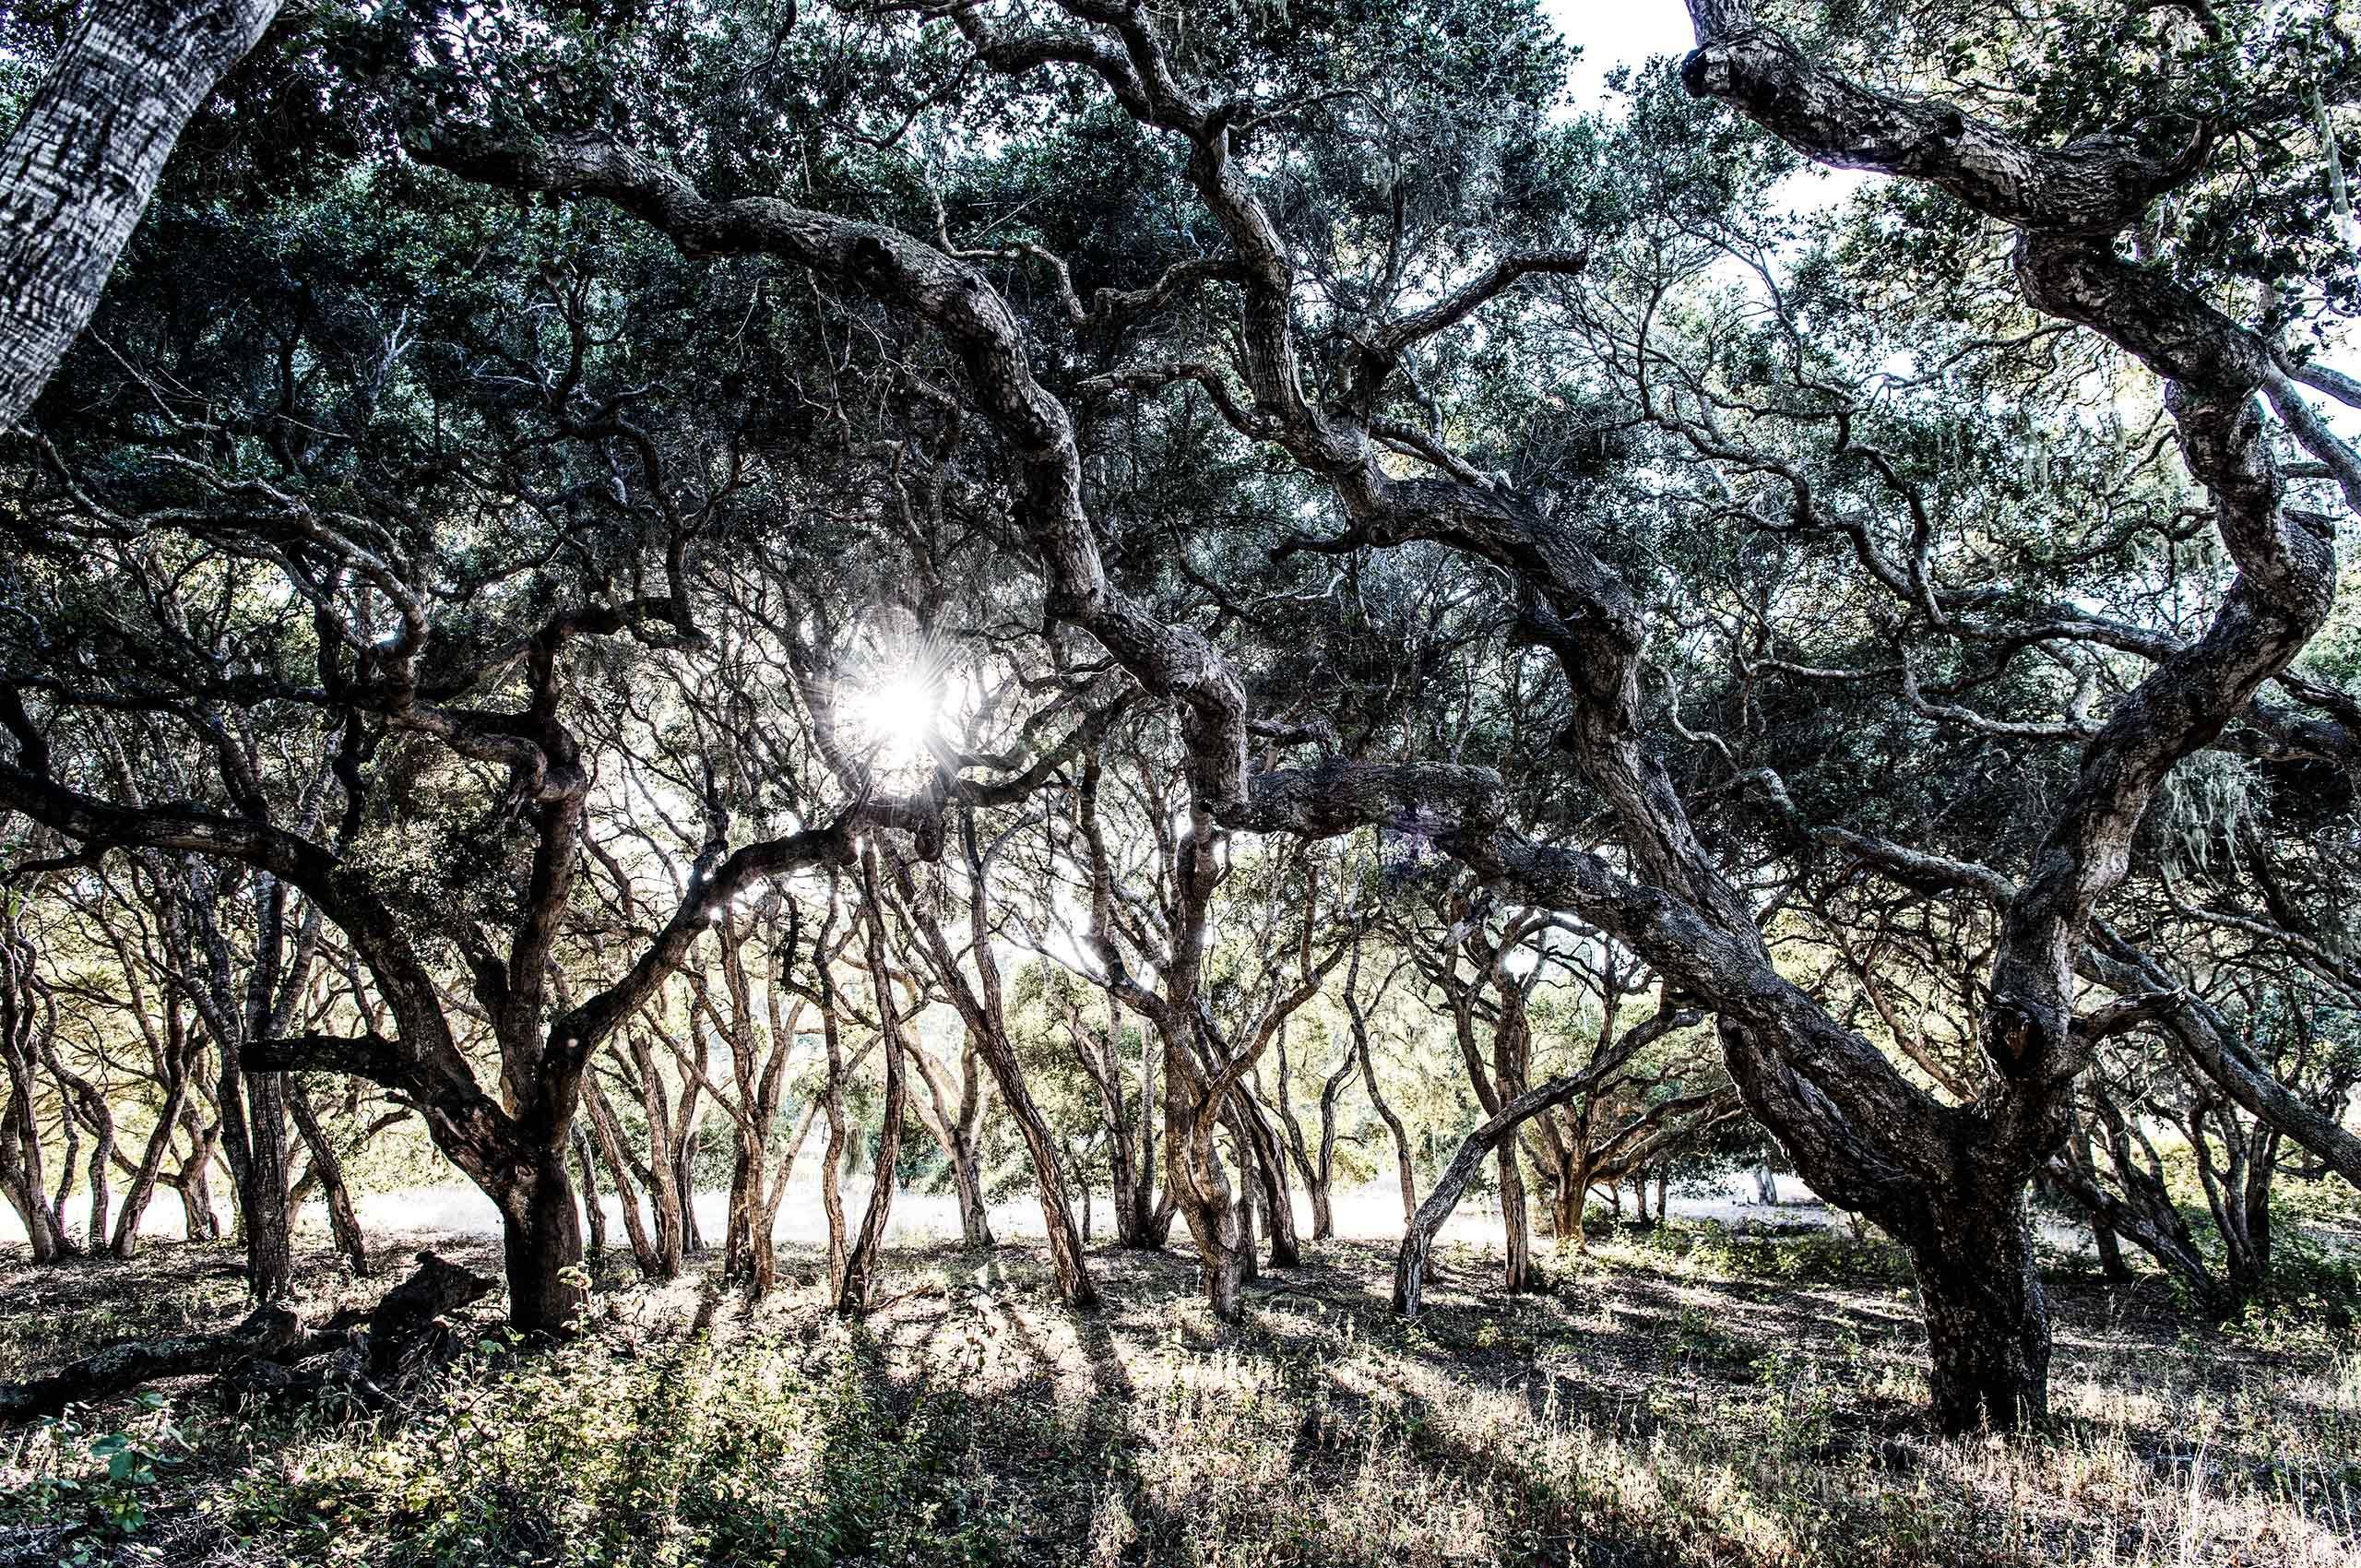 Trees-Walden-Monterey-California-by-HenrikOlundPhotography.jpg